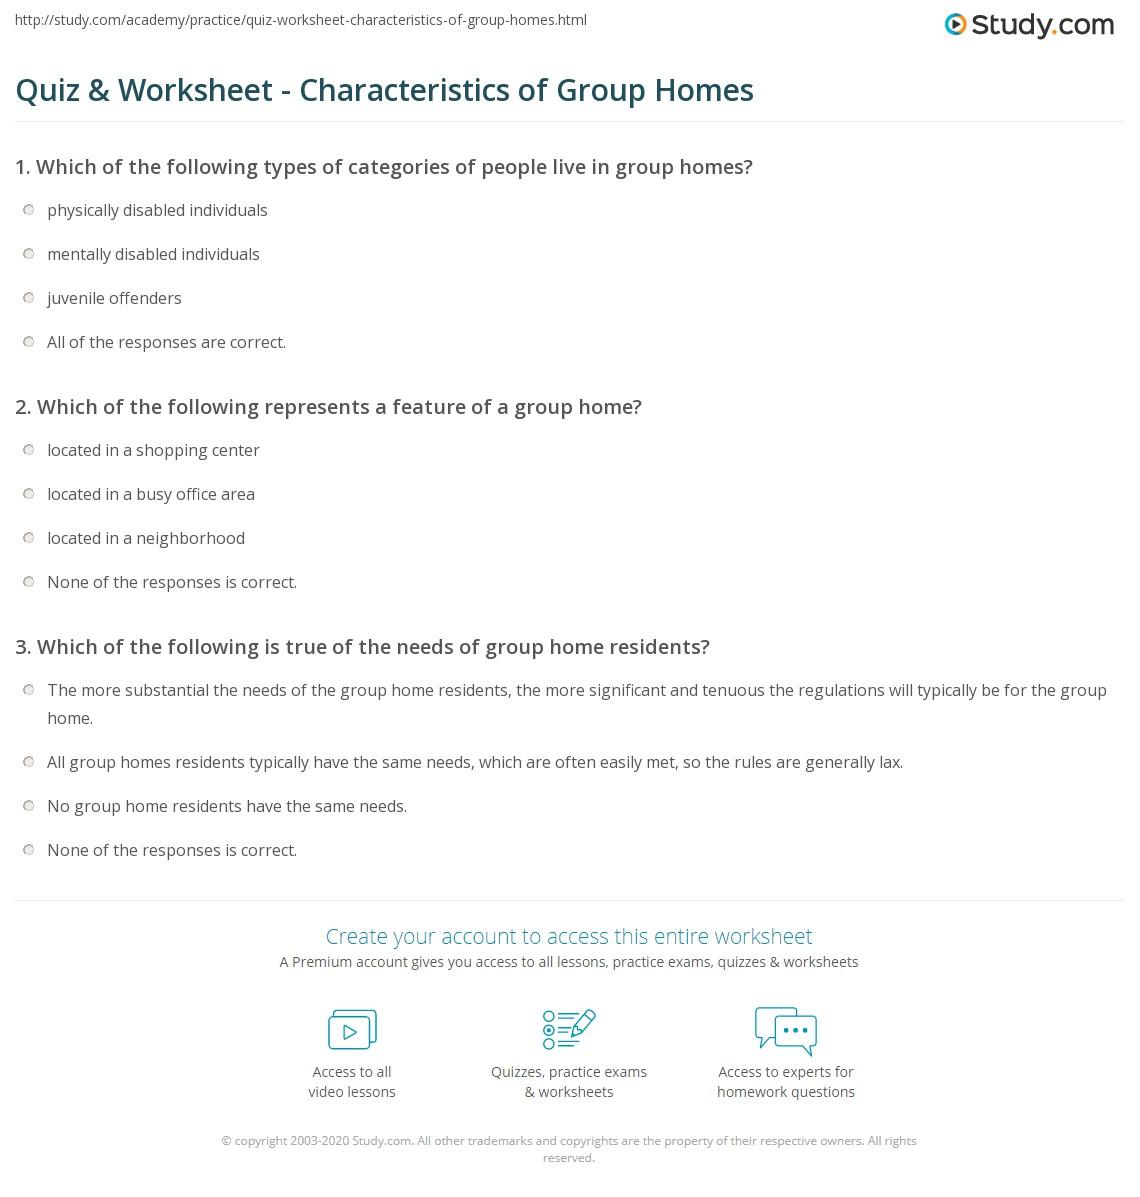 Quiz & Worksheet - Characteristics of Group Homes   Study.com